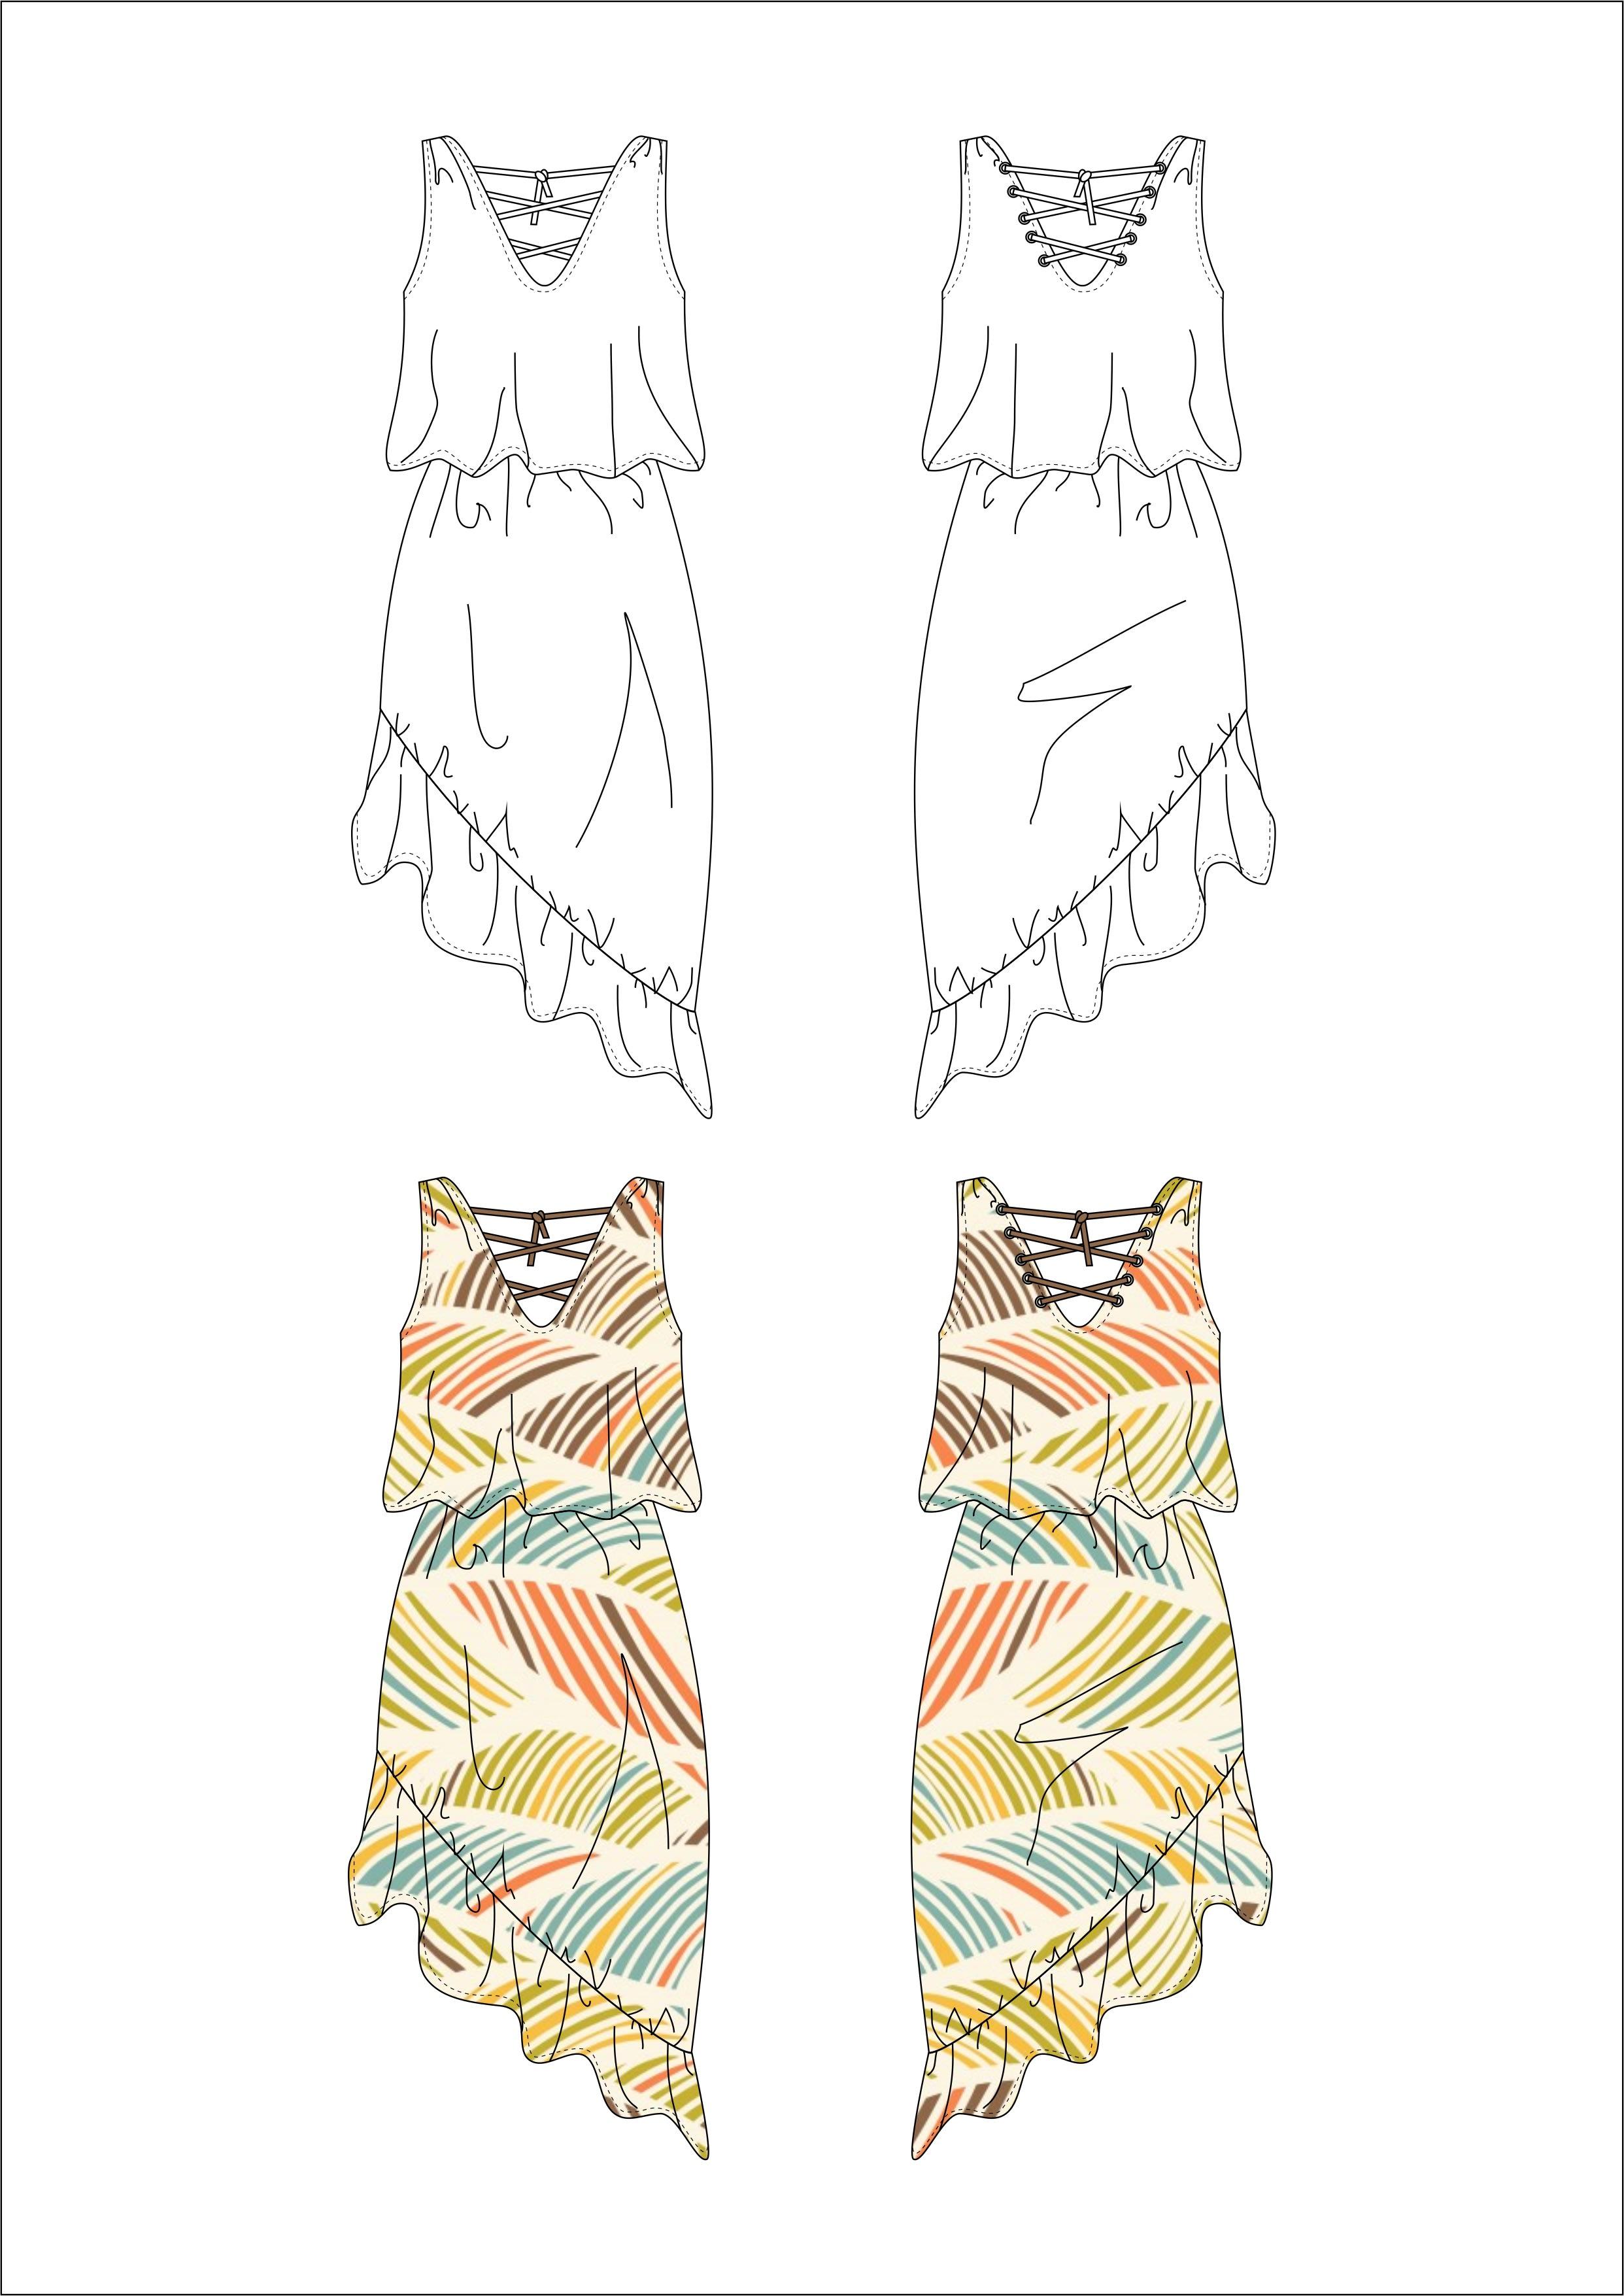 Draw Fashion Flat In Coreldraw By Kamilasztobryn